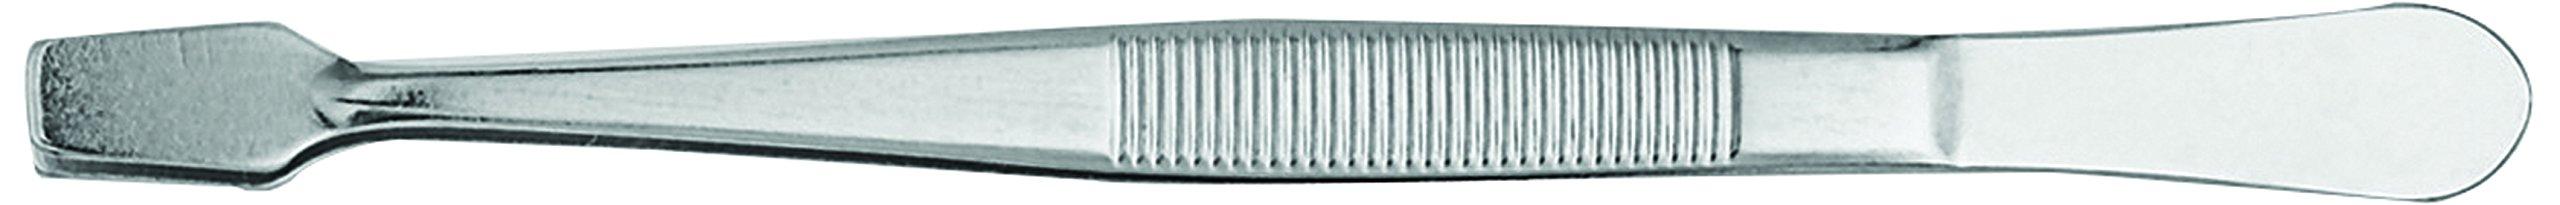 General Tools 416 Spade Point Utility Tweezers